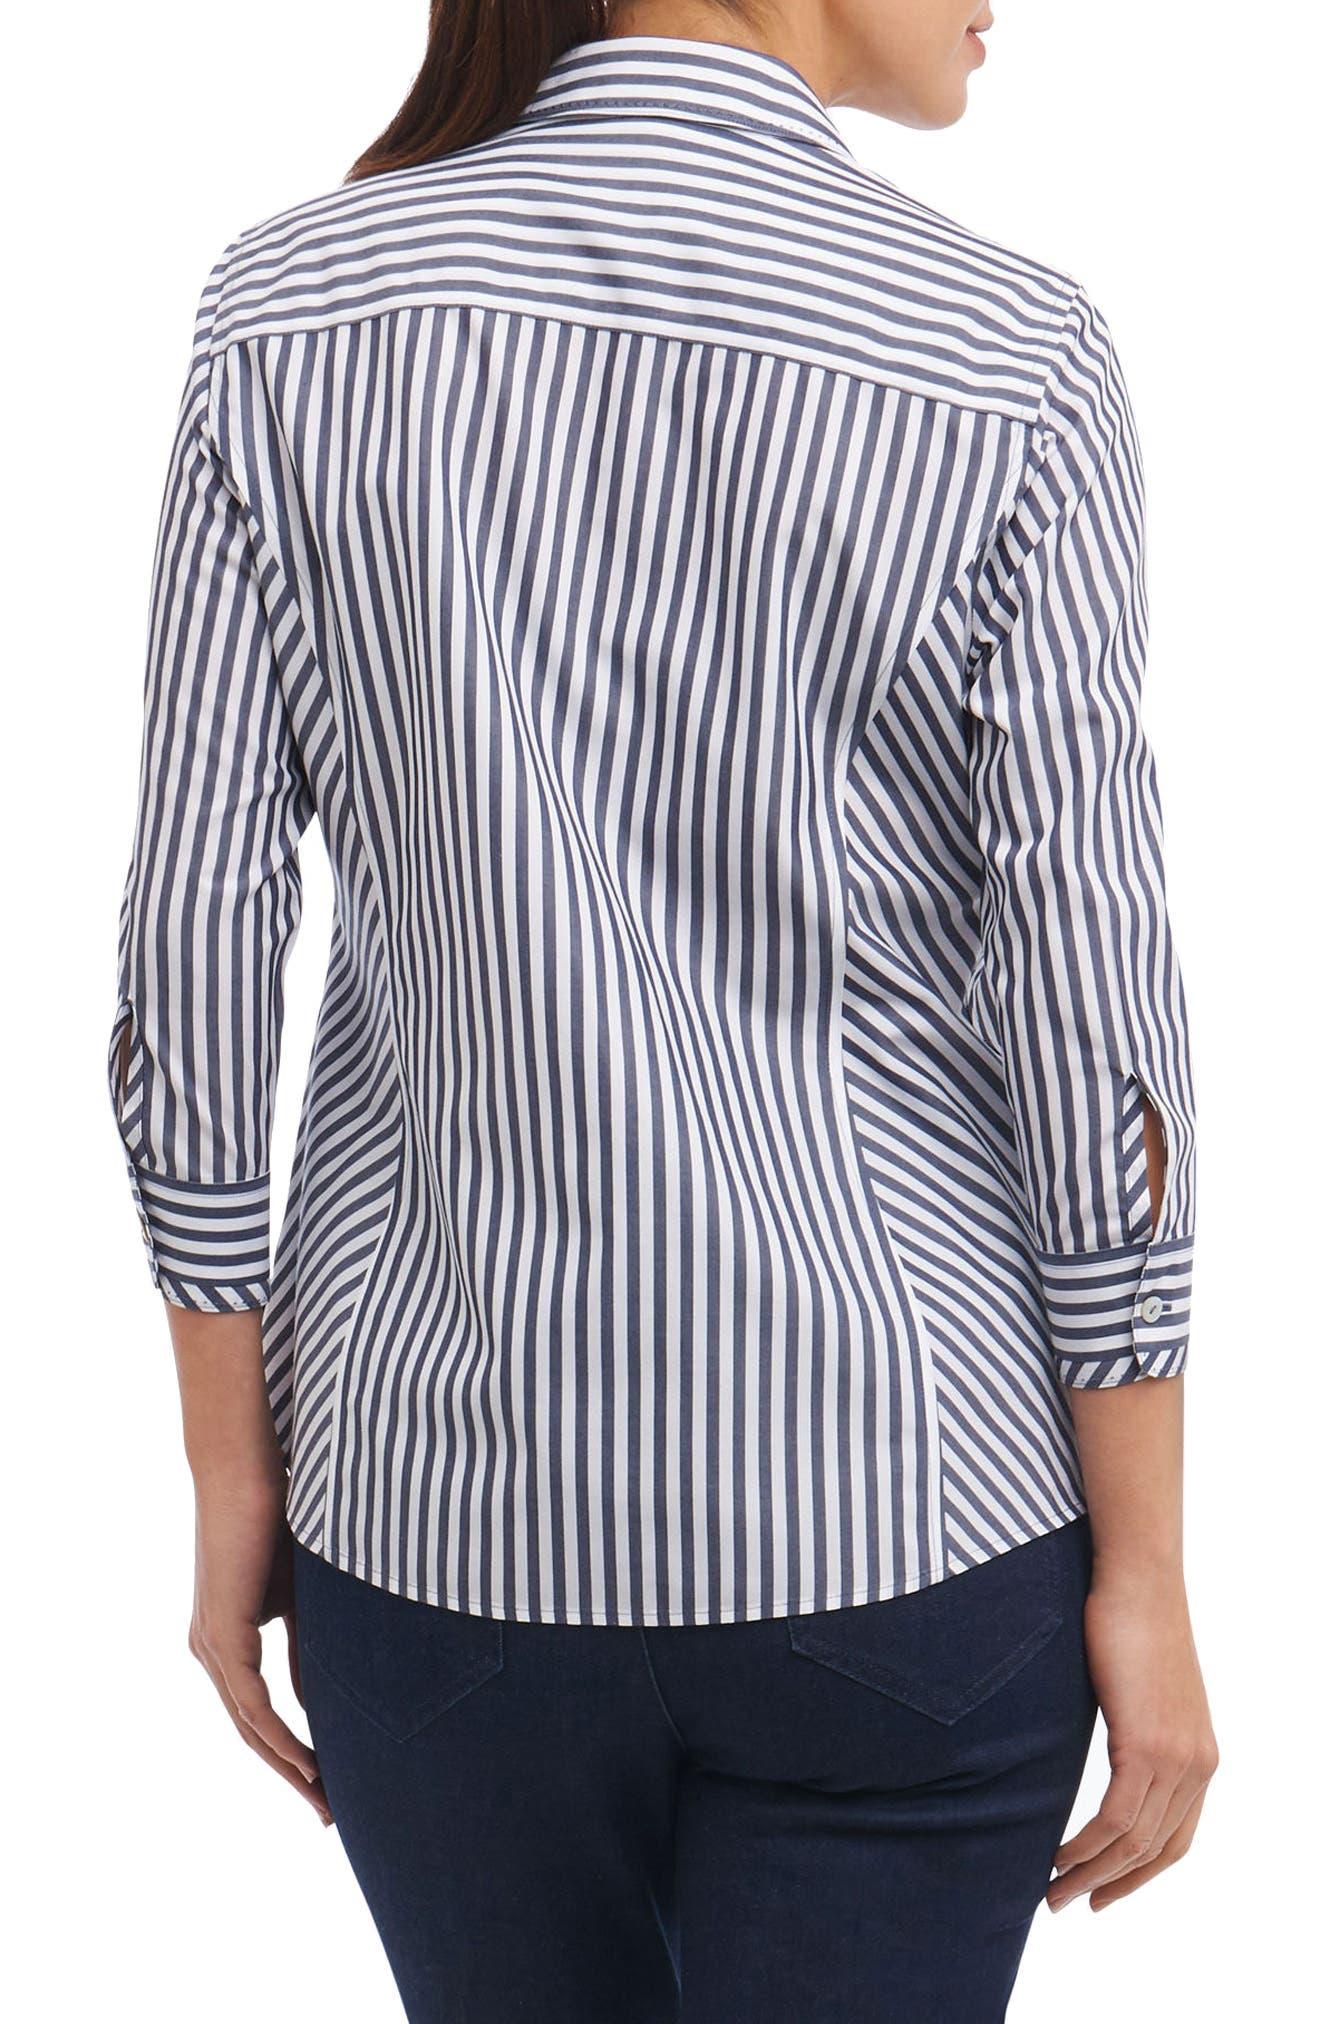 Hope Preppy Stripe Cotton Shirt,                             Alternate thumbnail 2, color,                             415